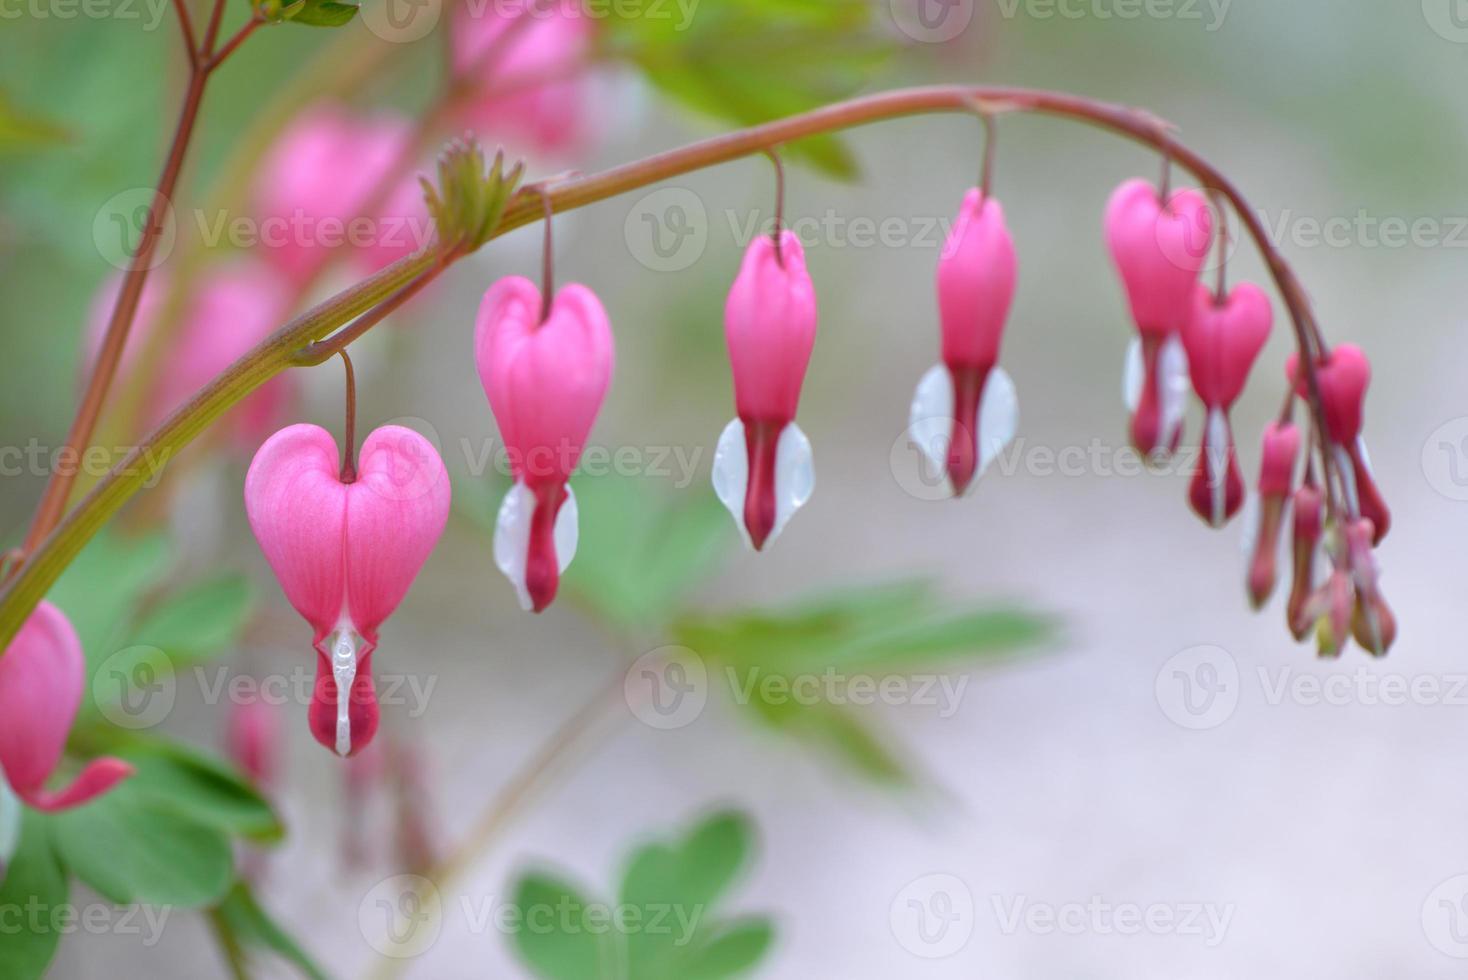 dicentra spectabilis, fiori di cuore foto